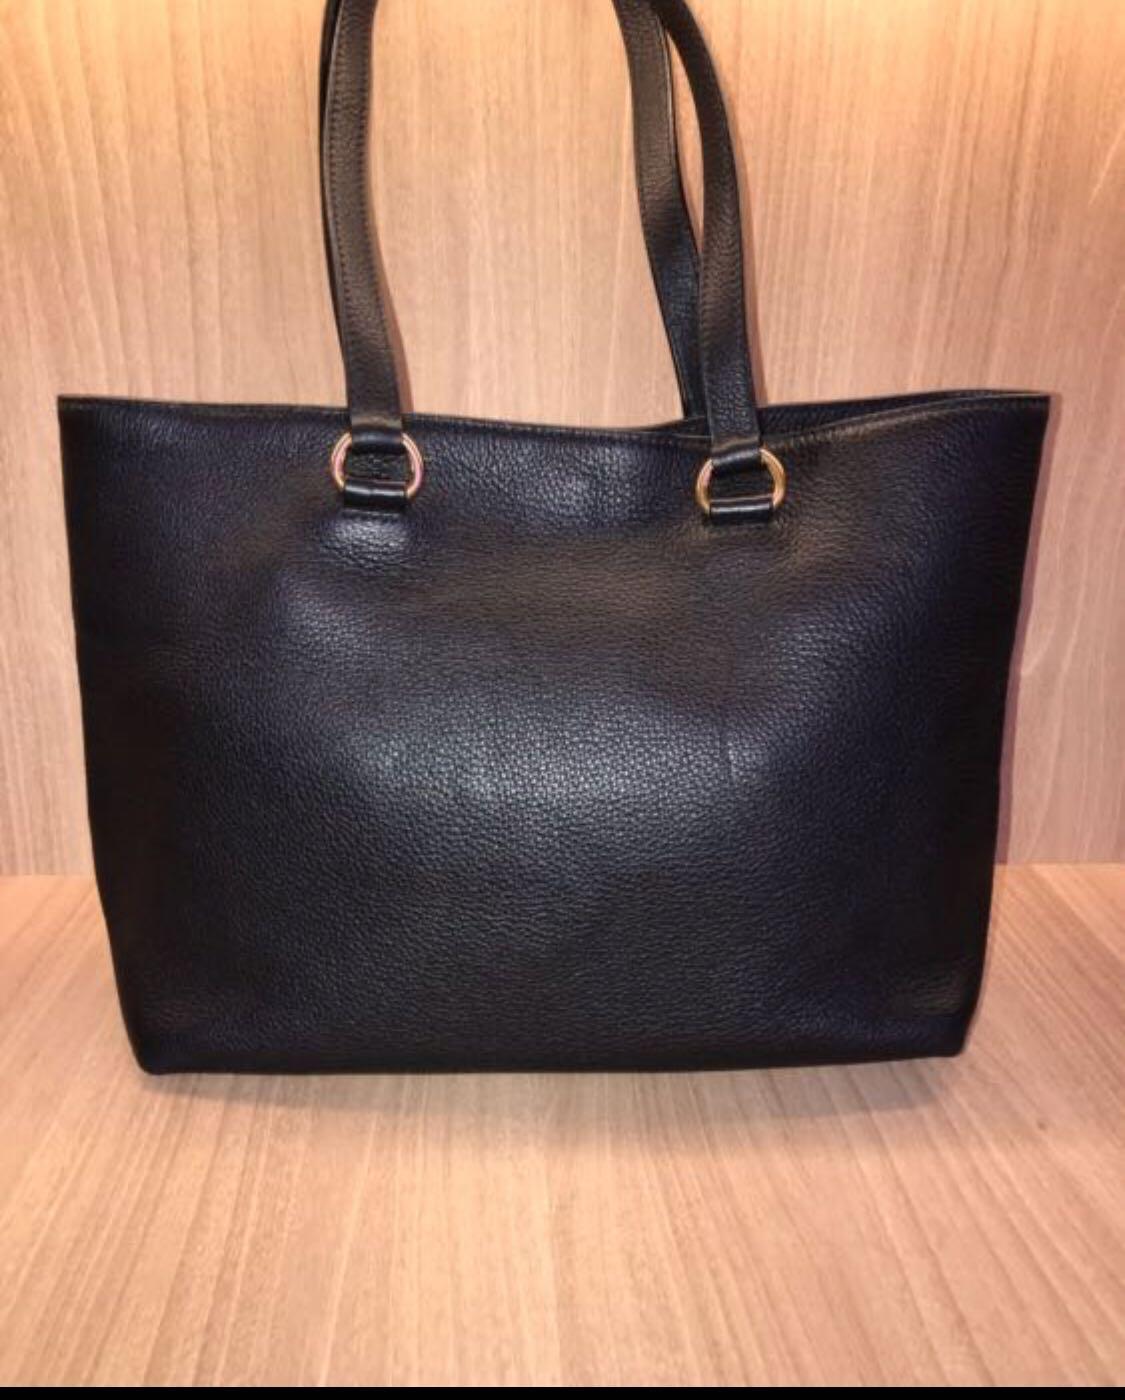 e482e577b040 ... greece prada black leather tote 2016 luxury bags wallets handbags on  carousell f58fe b1725